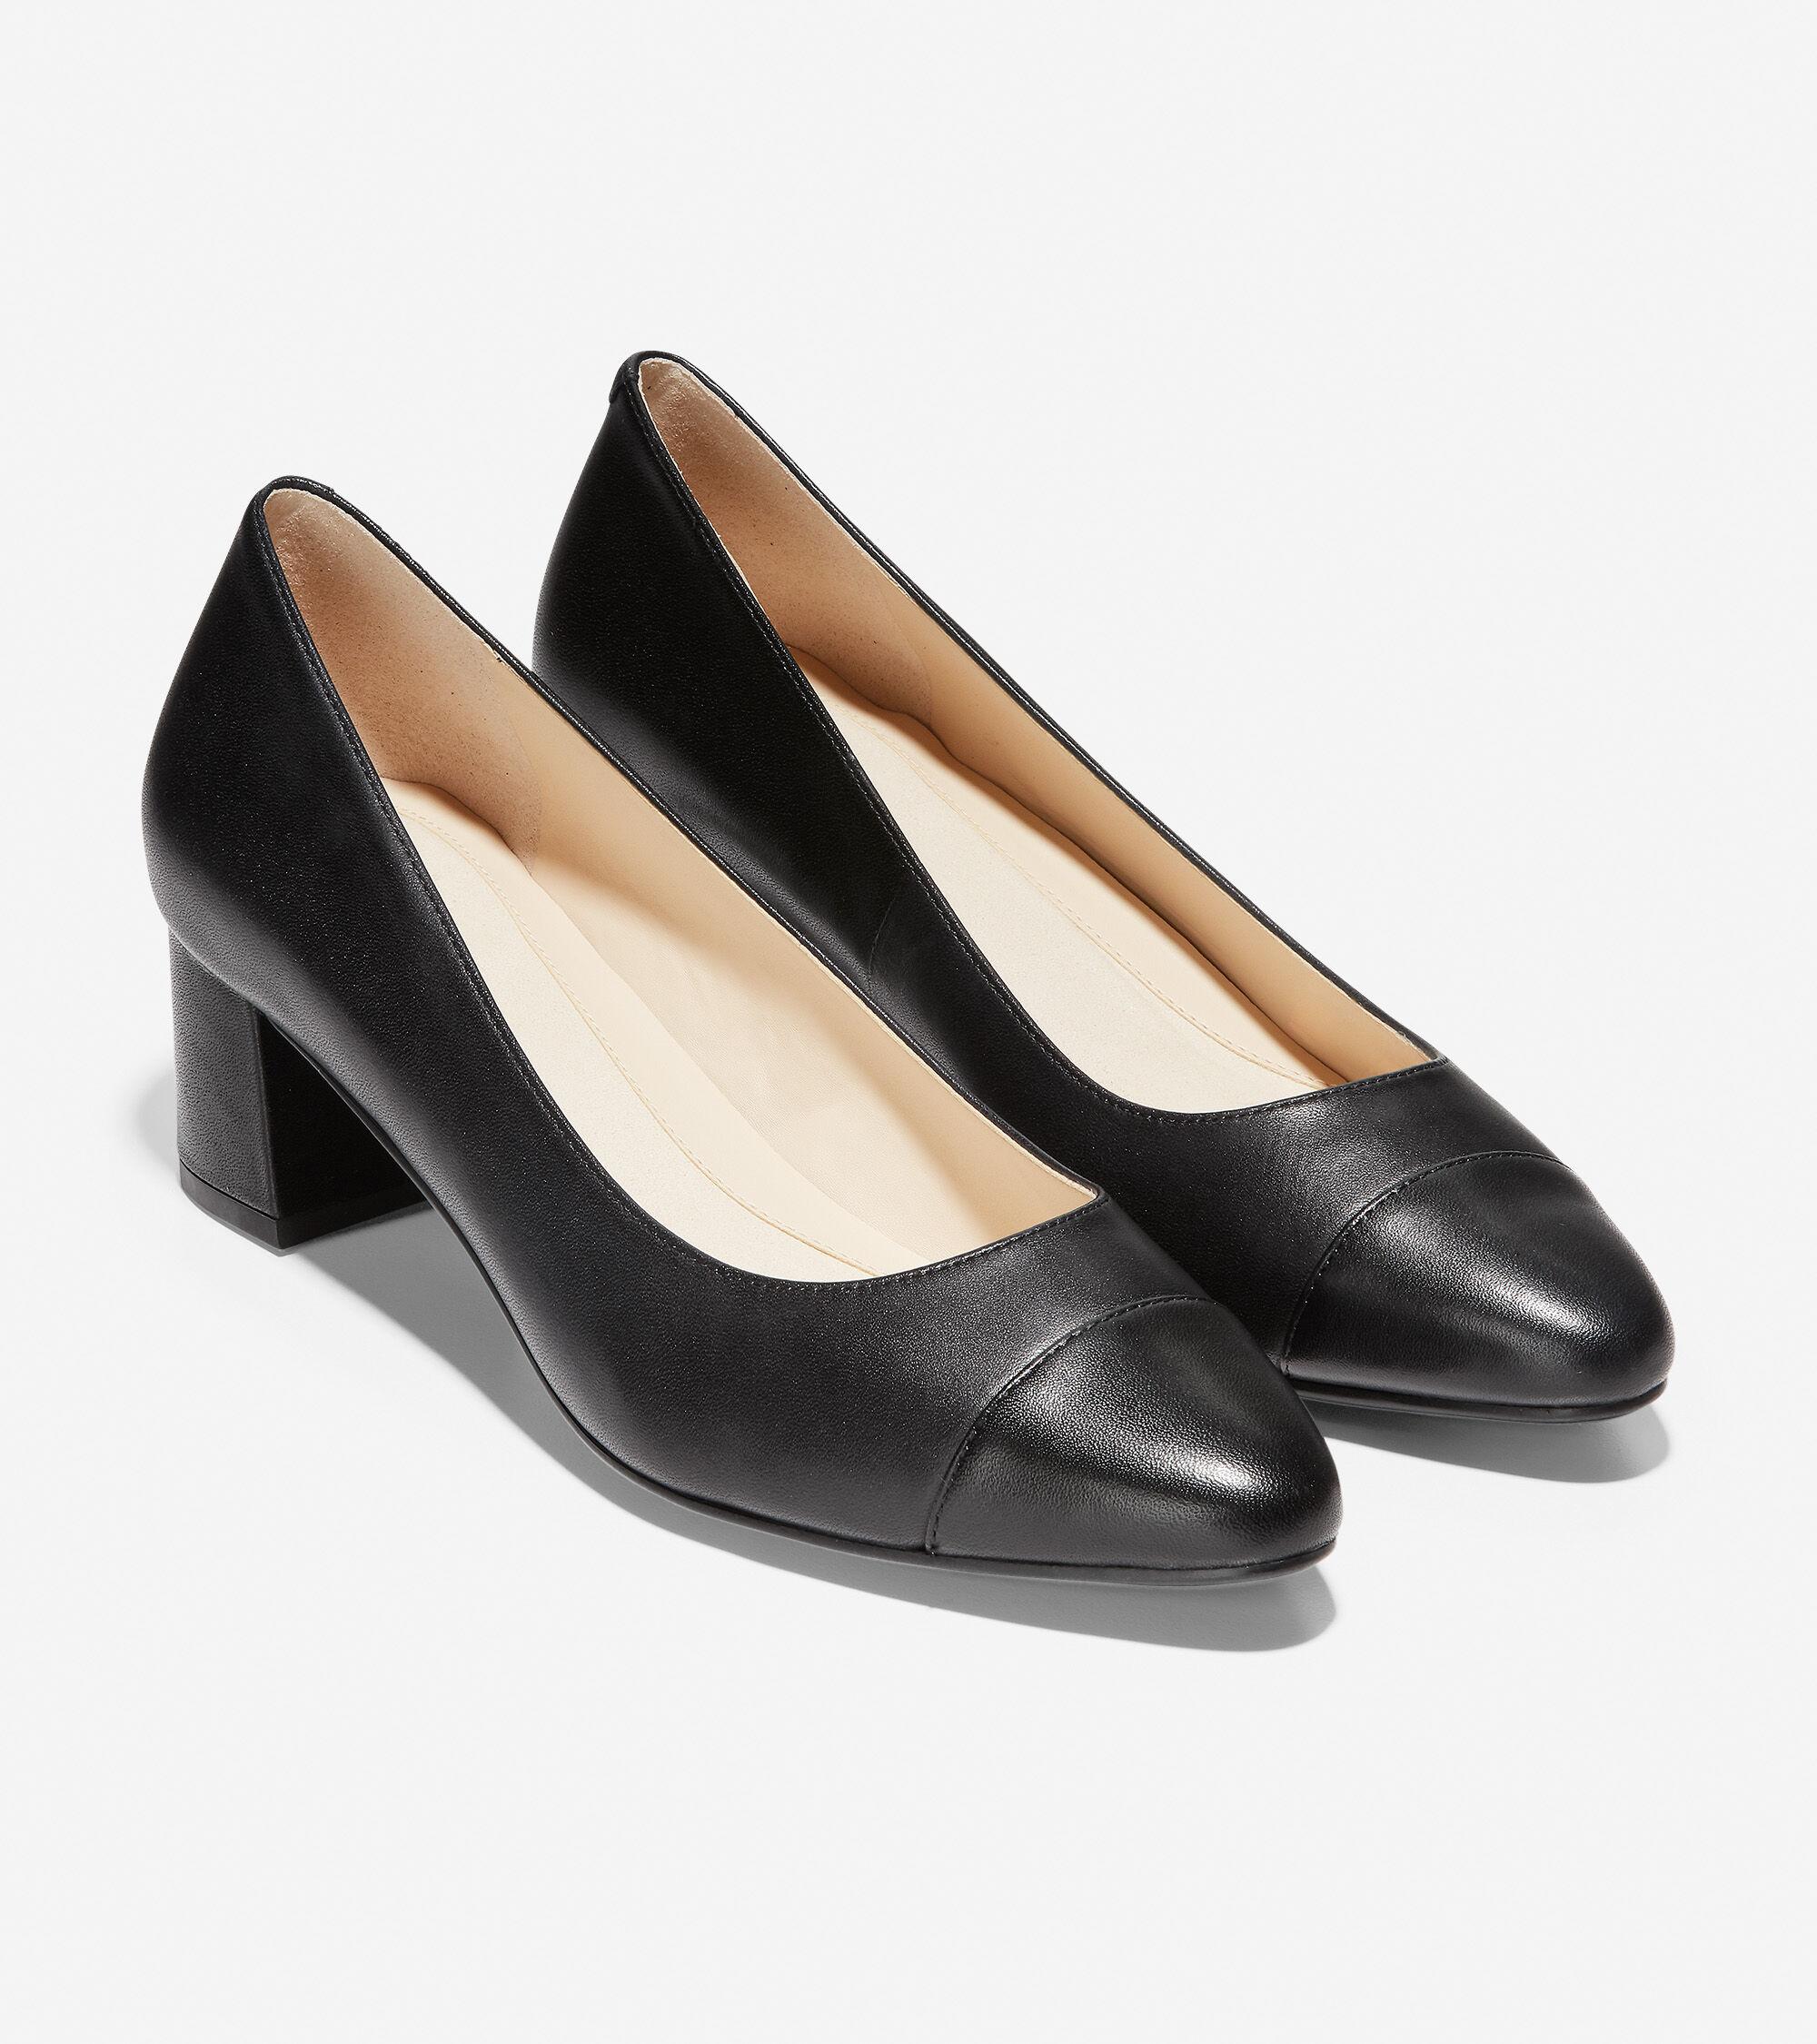 Go-To Block Heel Pump in Black Leather